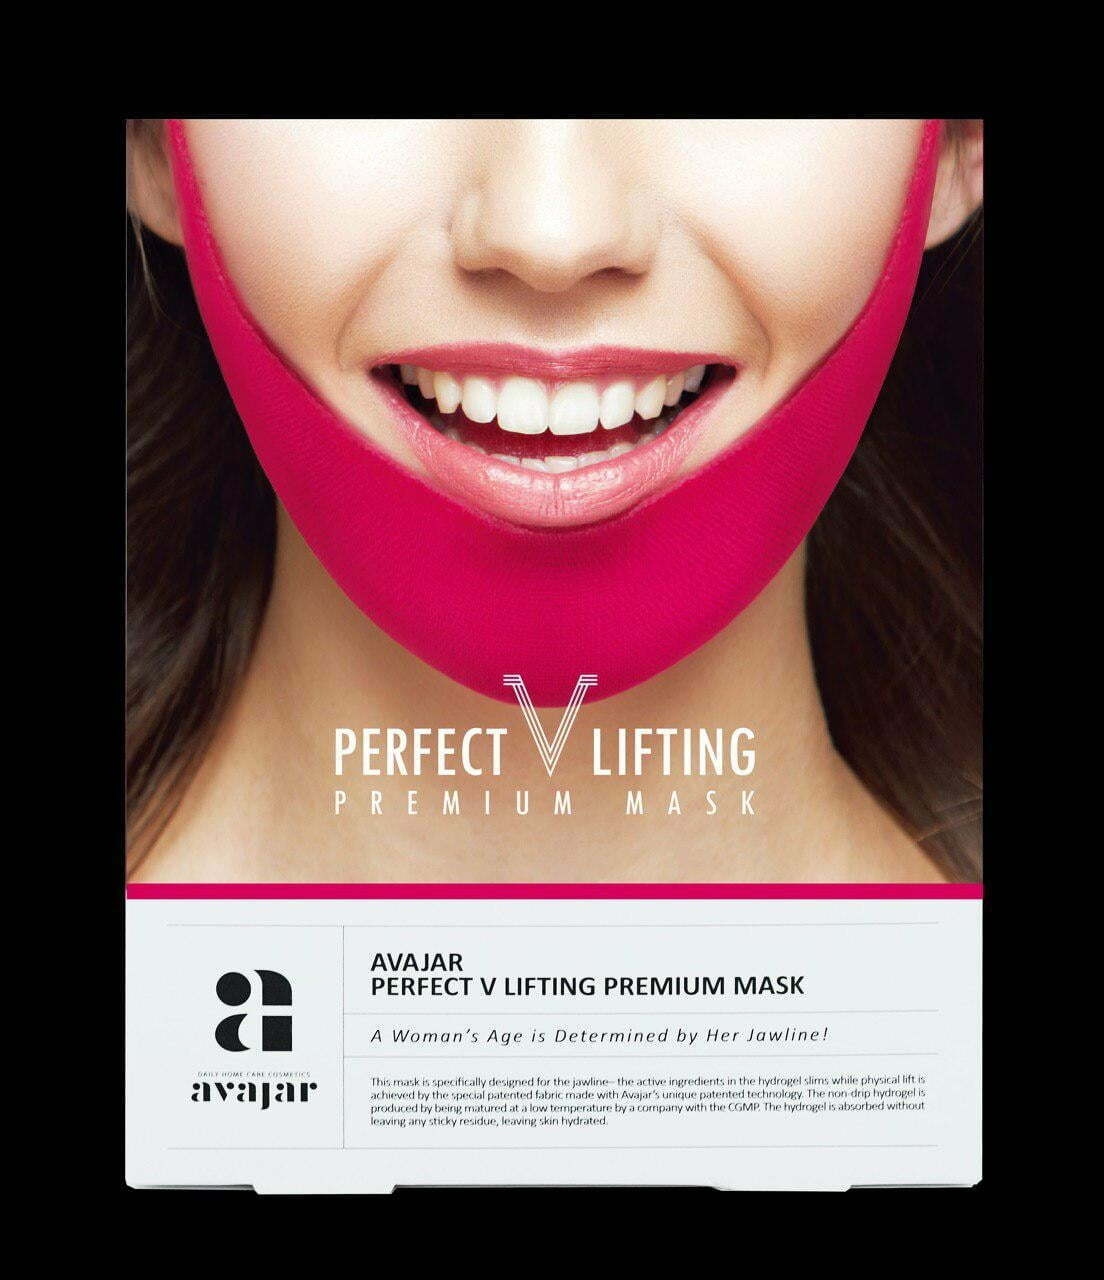 Korea AVAJAR Perfect V Lifting Premium Mask 11g K Beauty Cosmetics